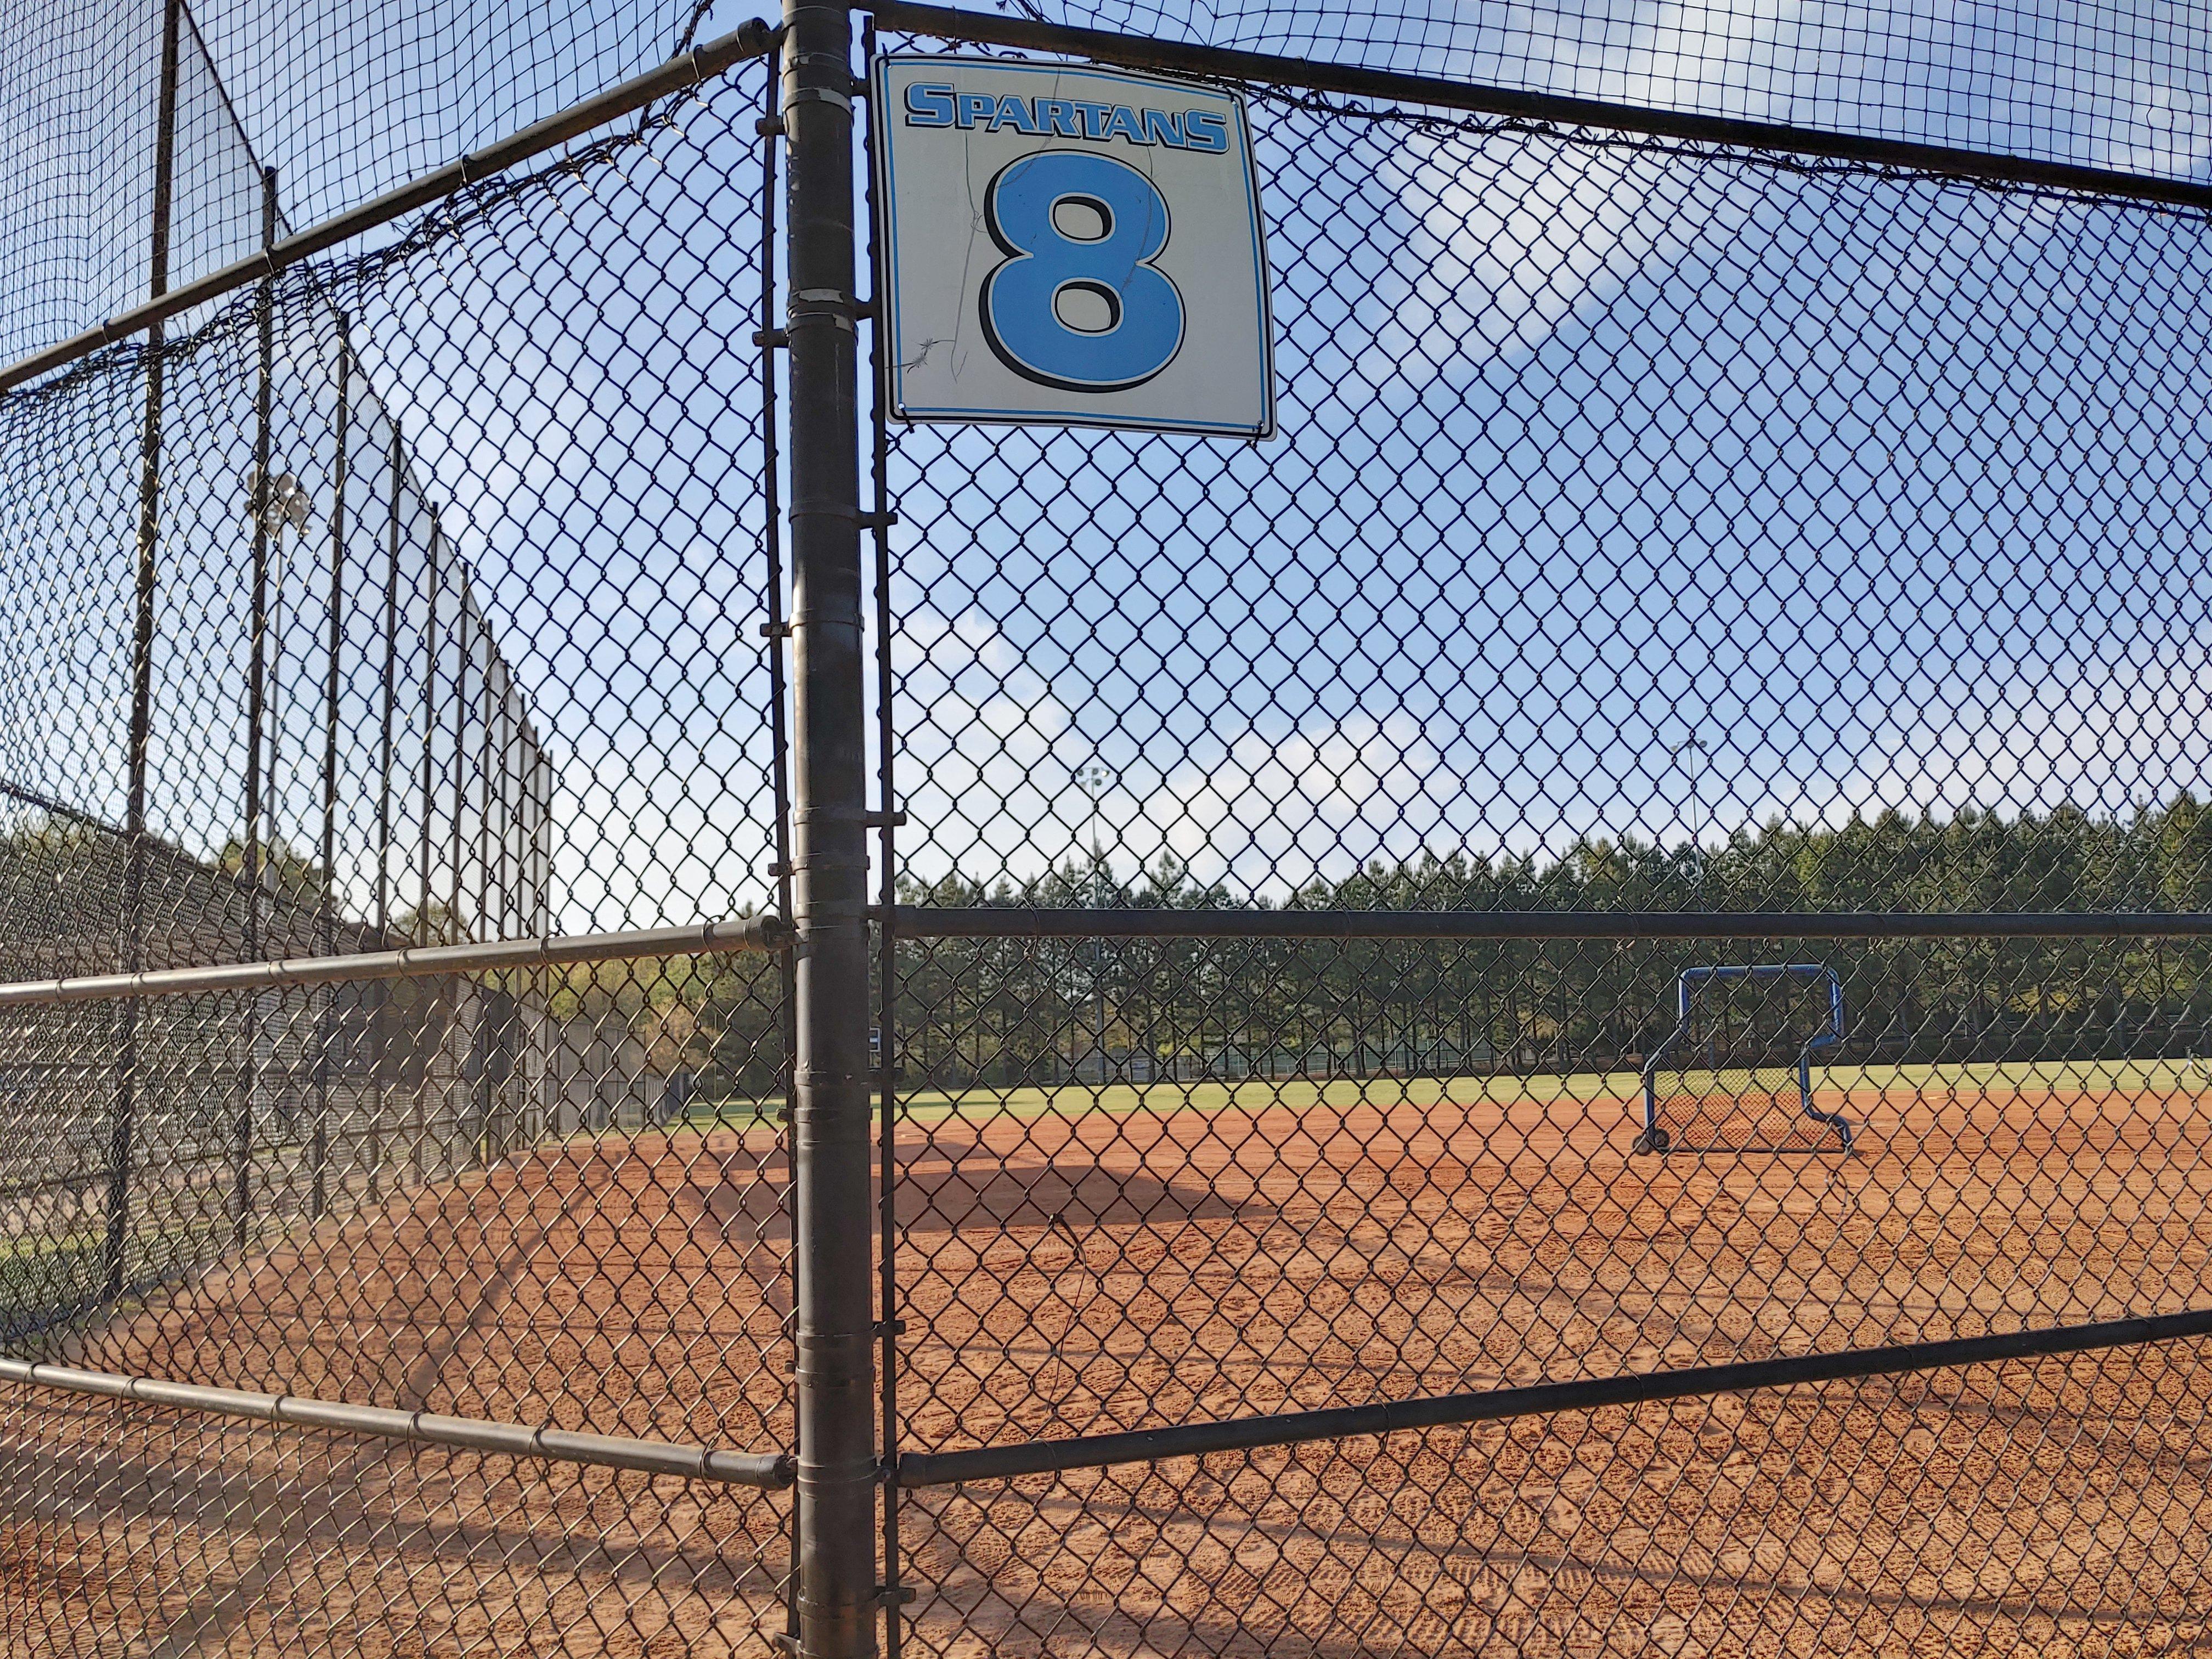 Sharon Springs Ball Field